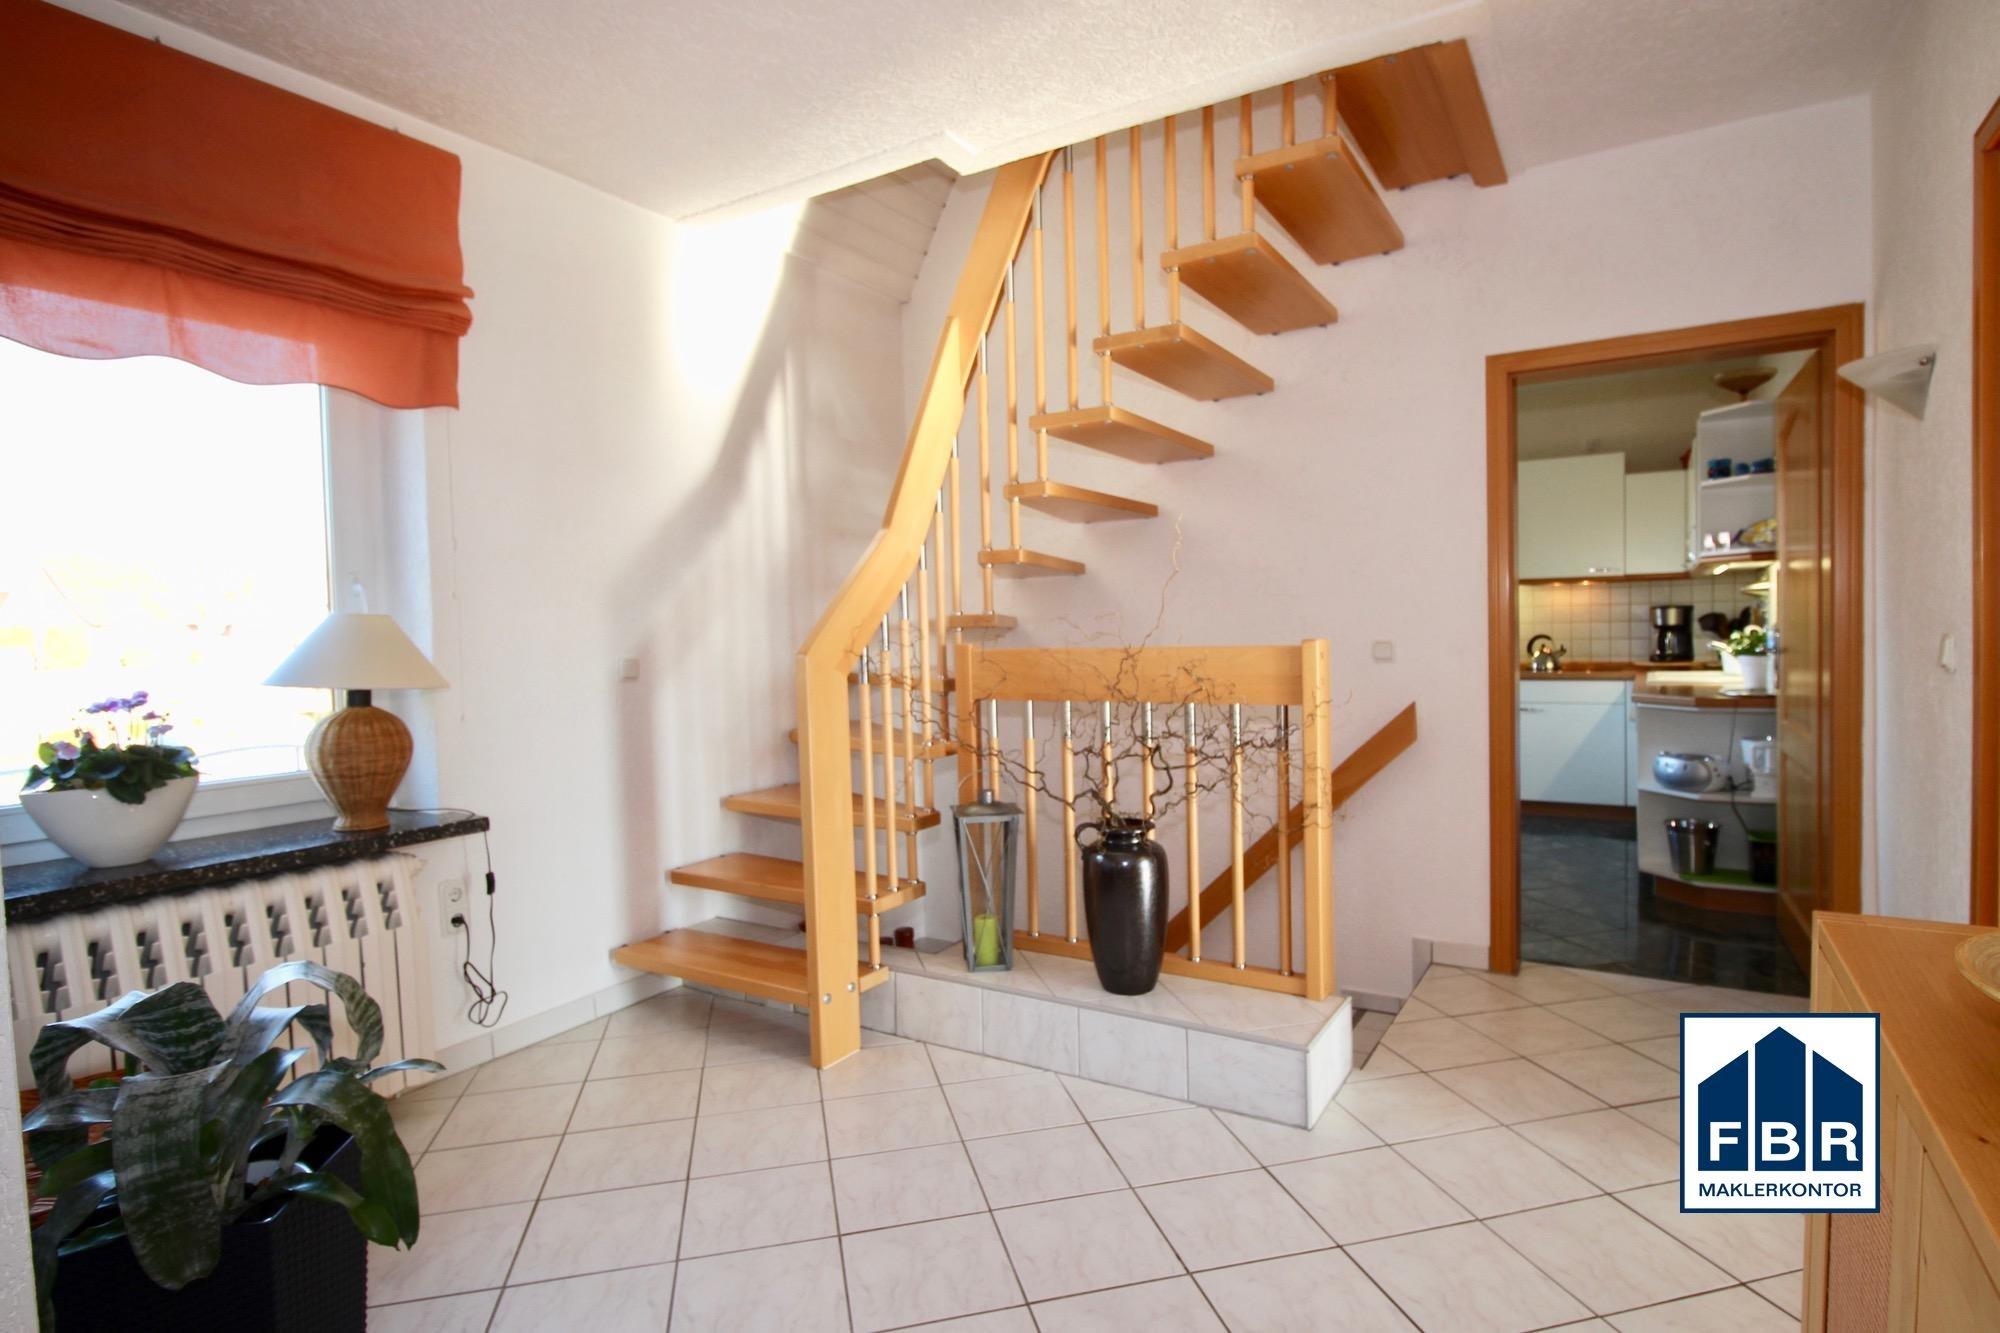 Flur mit Keller- und Dachgeschosstreppe